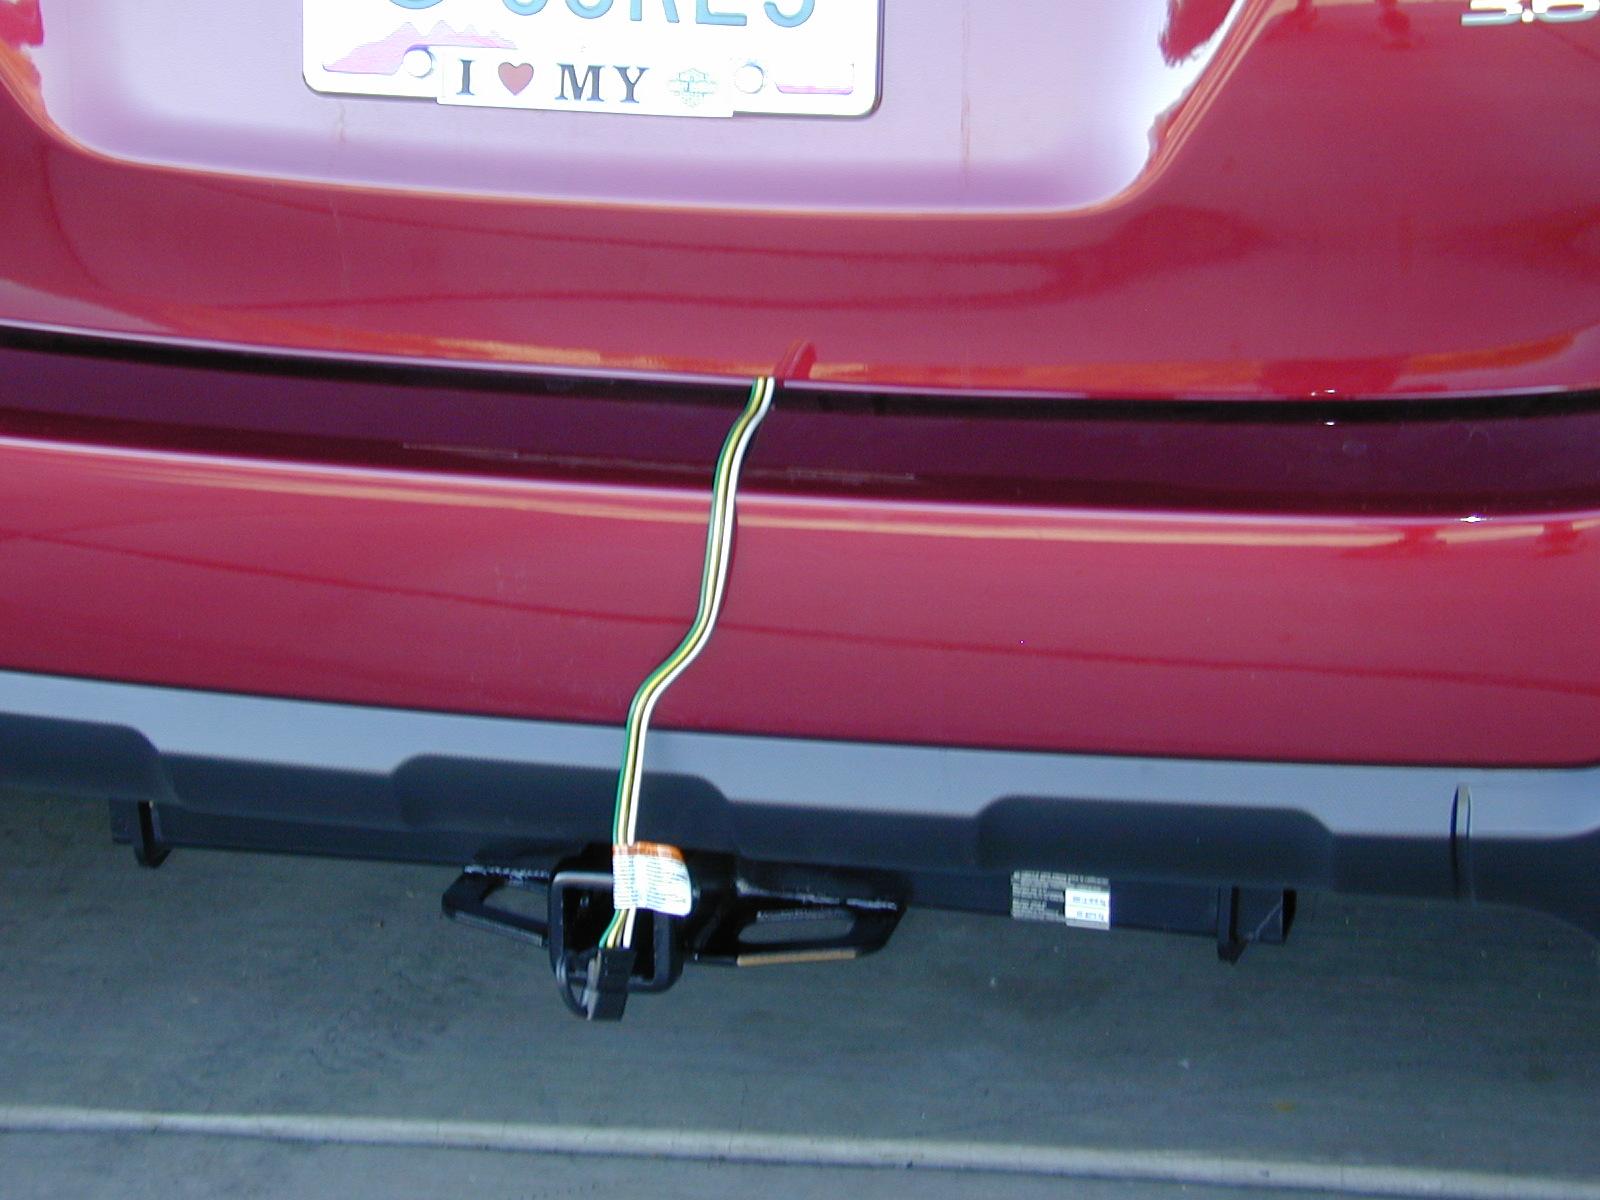 Hitch wiring, U-Haul version. | Subaru Outback Forums on u-haul trailer wiring kit, toyota wiring harness, u-haul trailer light harness, u-haul wiring adapter, camper wiring harness, diesel wiring harness, u-haul wiring harness diagram,